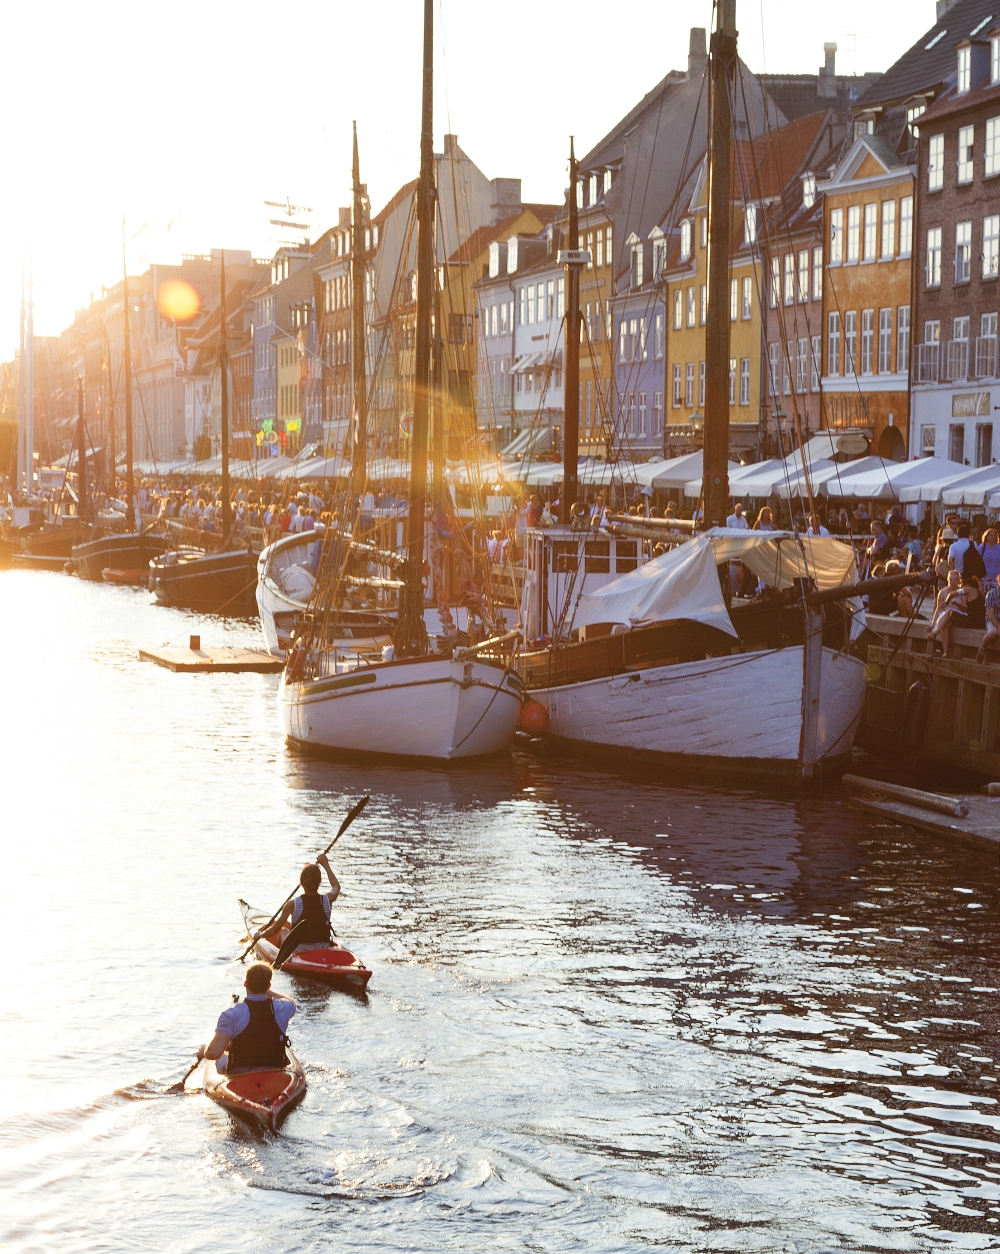 14132_Nyhavn, København_Kim Wyon (1).jpg